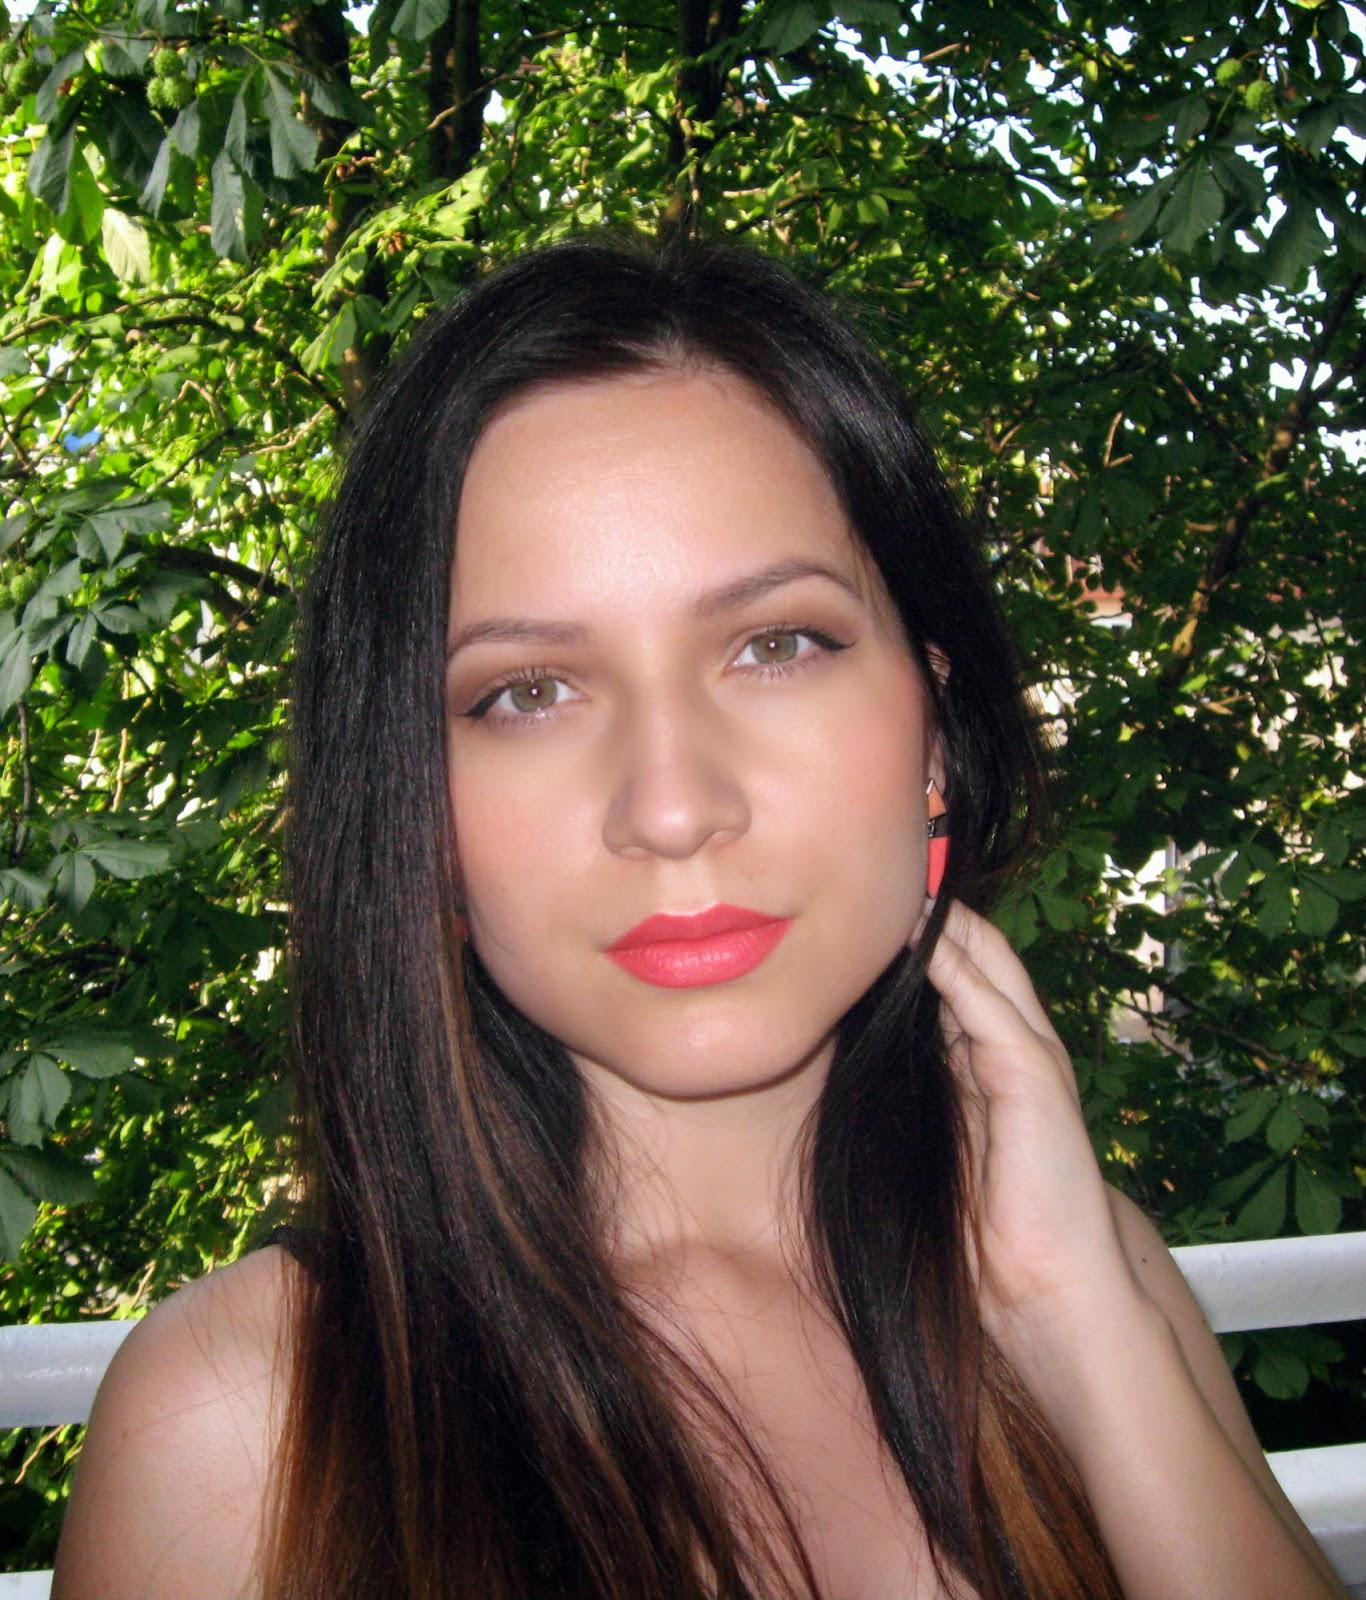 orange earrings, orange lipstick, orange is the new black, avon lipstick, beauty and make up, make up inspiration for spring and summer, orange triangle earrings